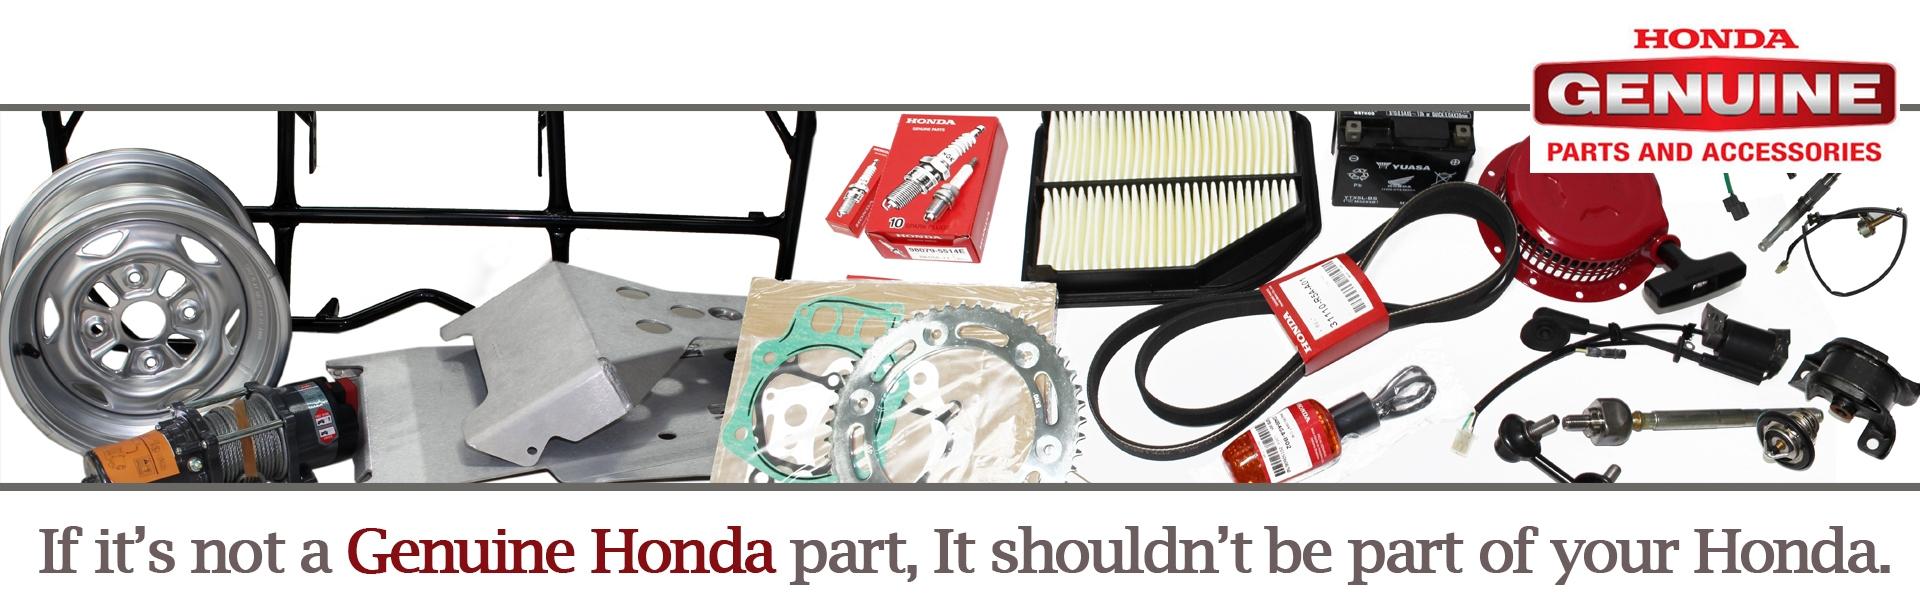 Genuine Honda Parts and Accessories